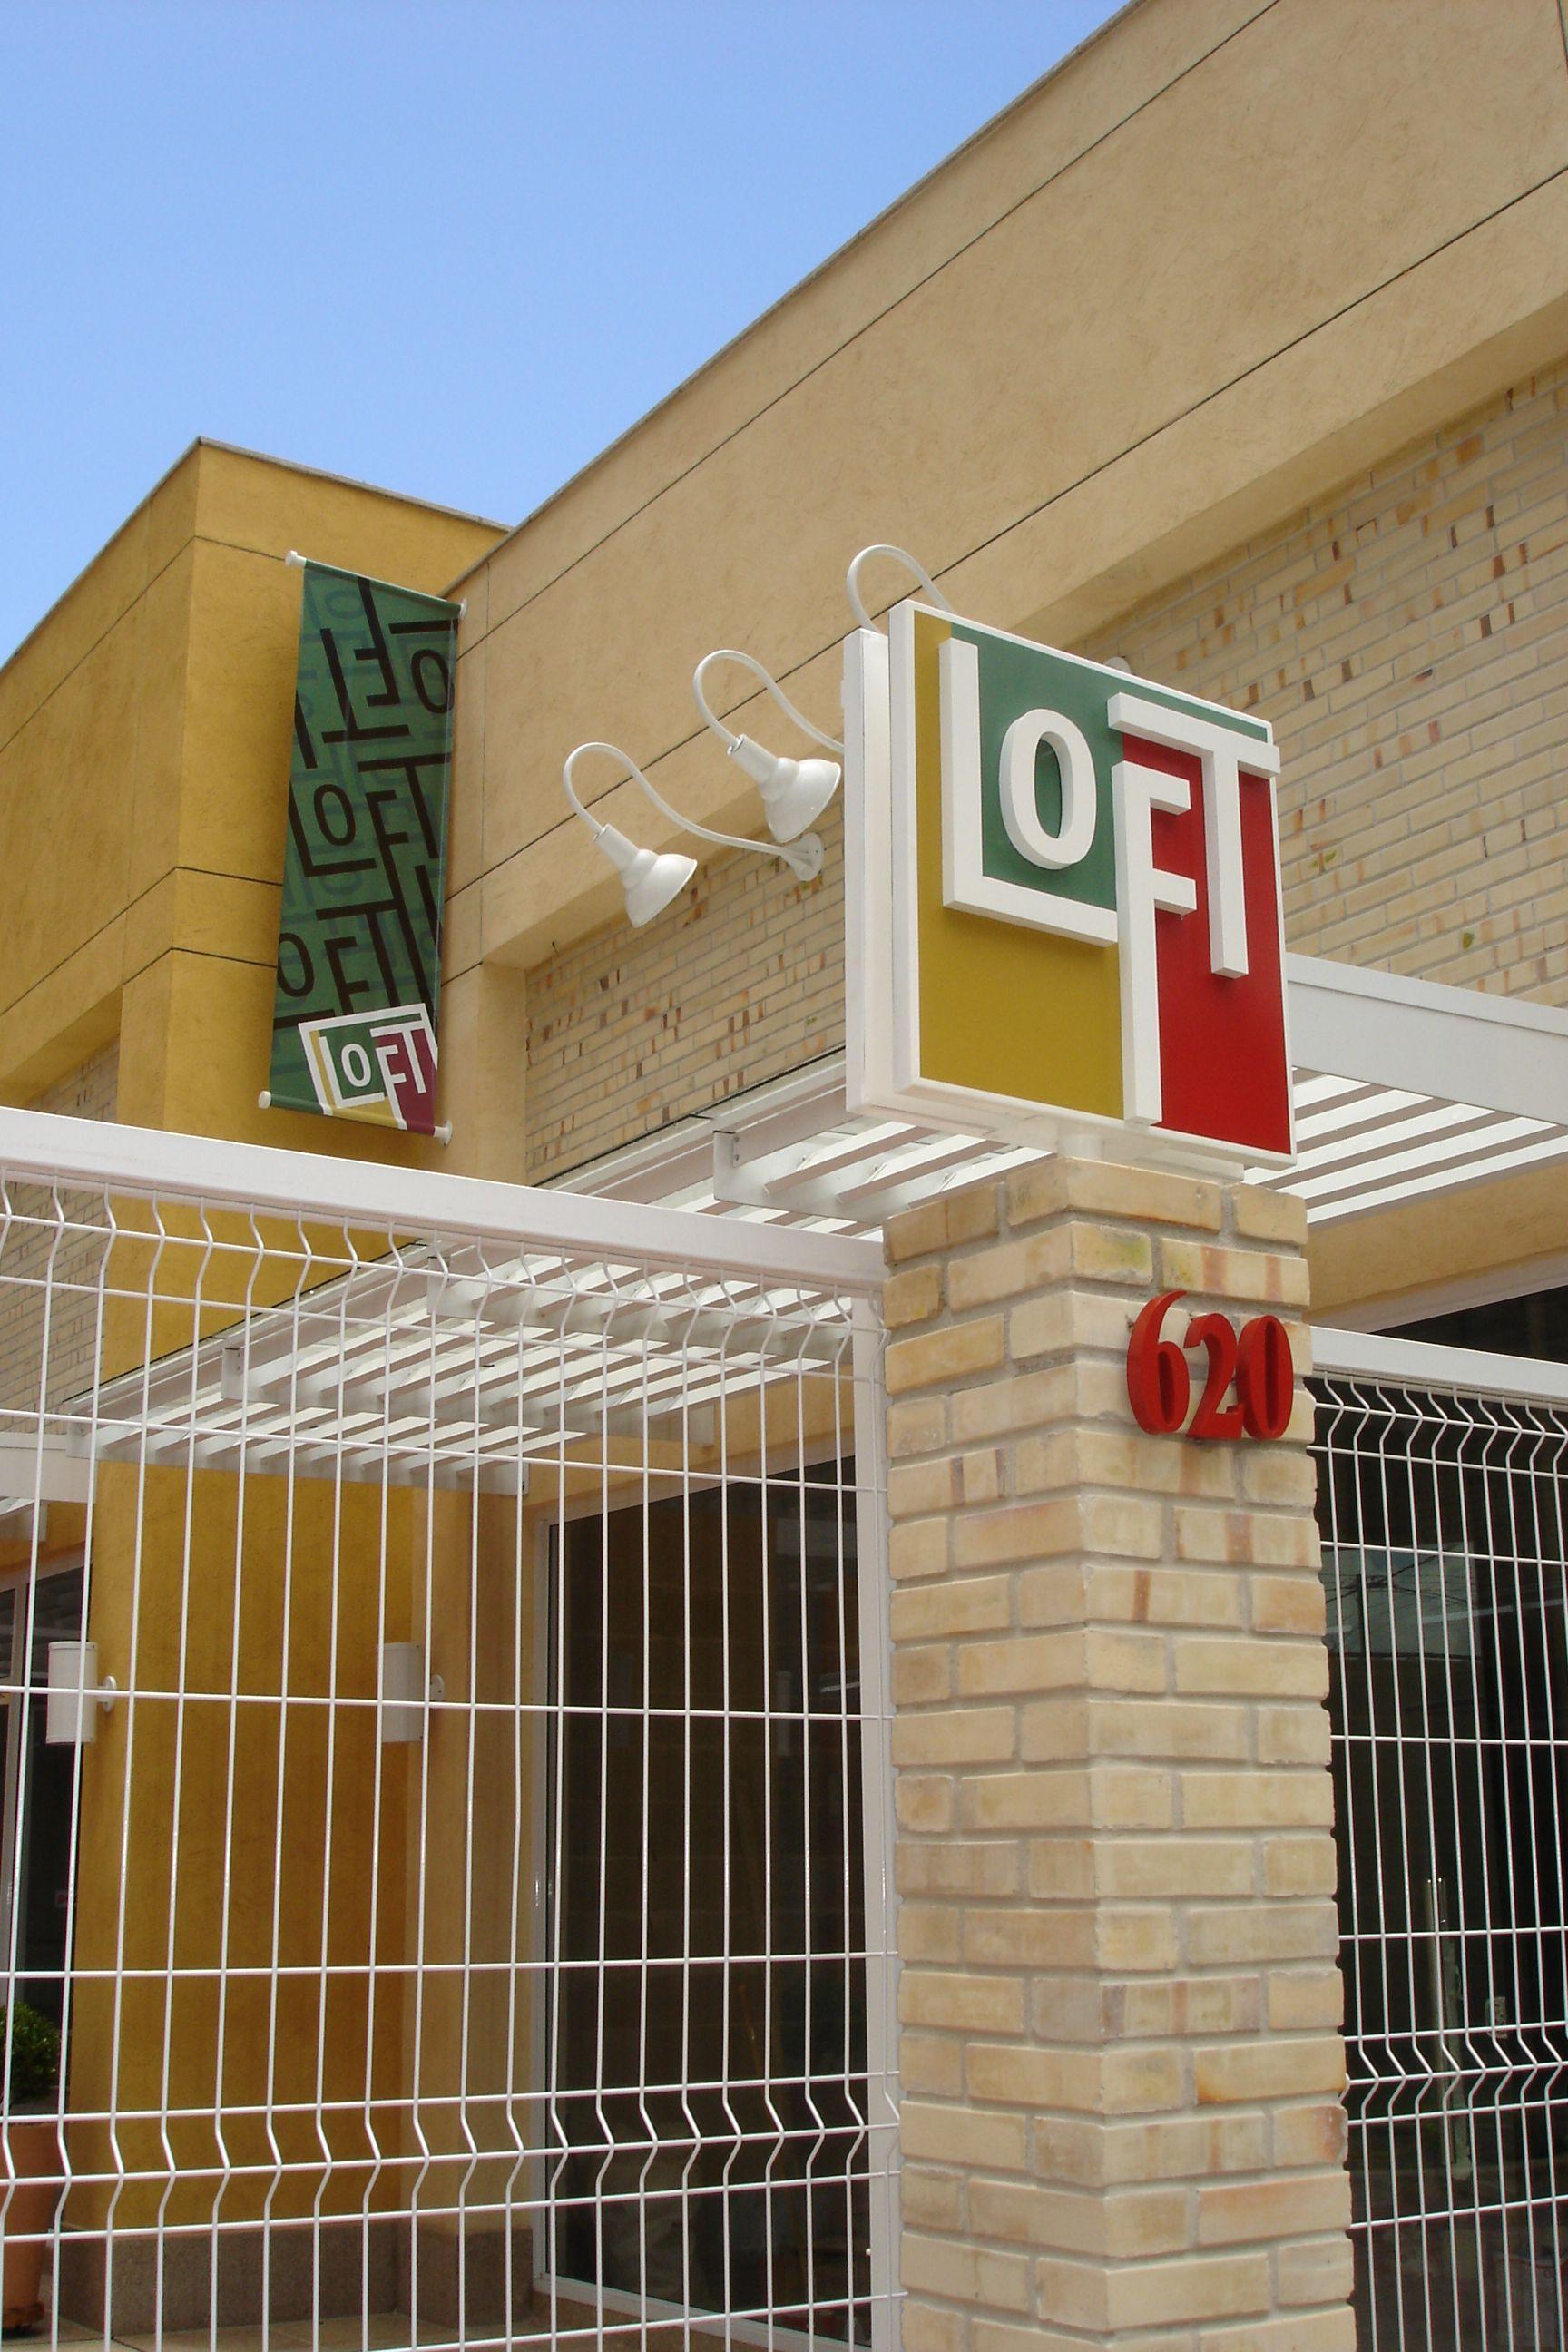 #Wayfinding #Loft 620 - Vila Velha (ES) - Brazil #braziliandesign #design #shopping #malls